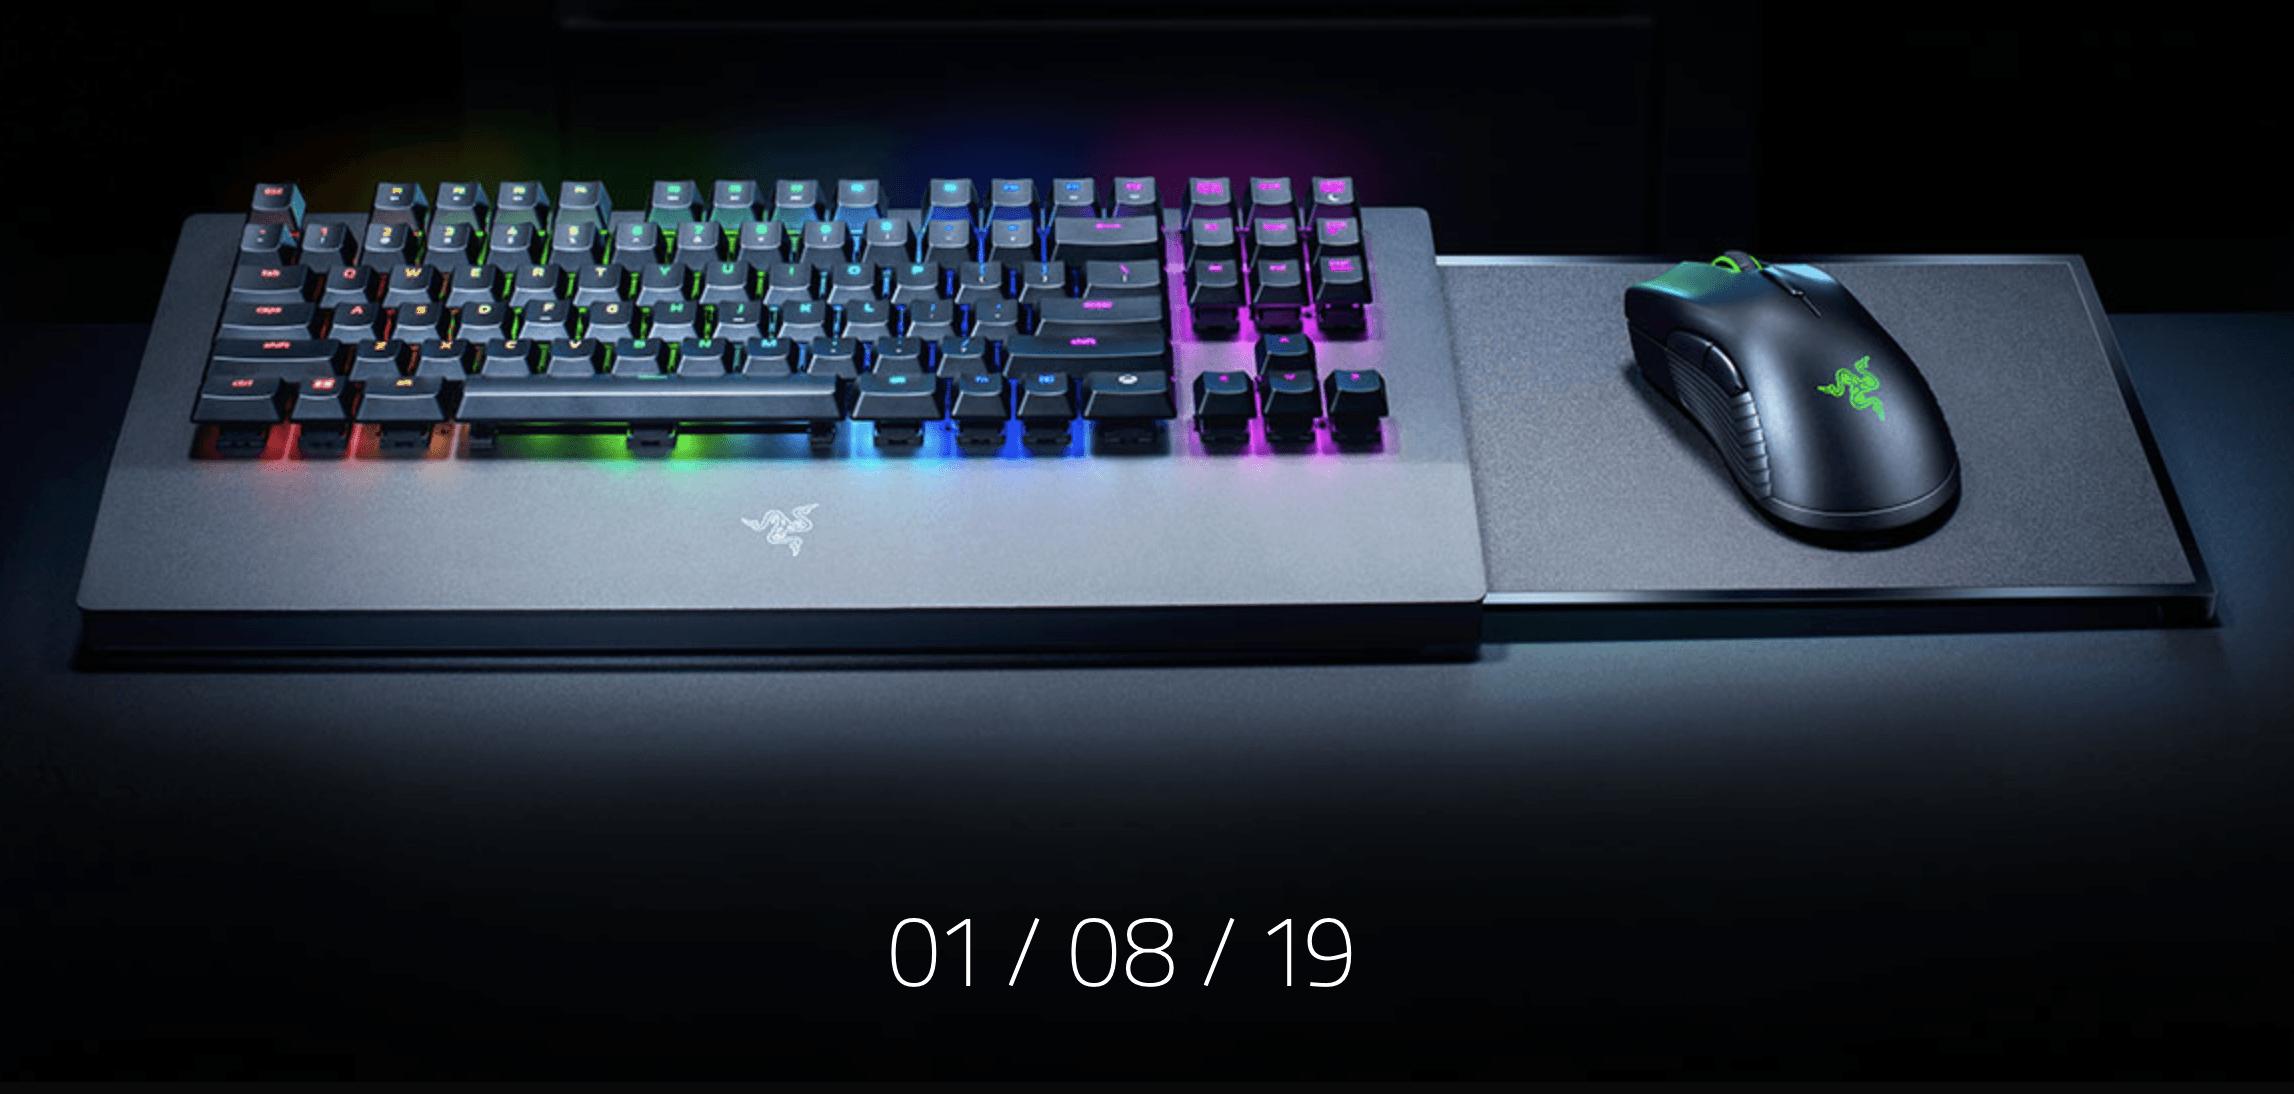 clavier souris xbox one